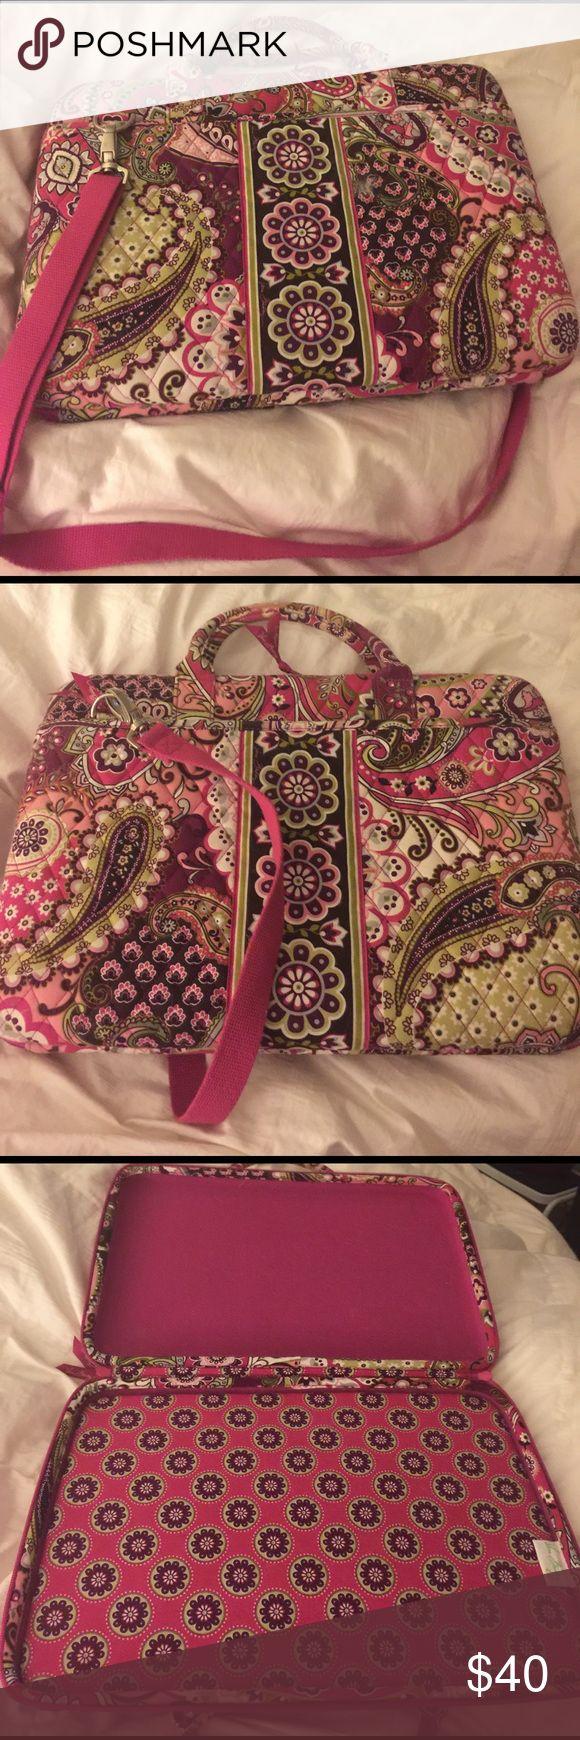 Vera Bradley laptop bag Very berry Paisley print laptop bag Vera Bradley Bags Laptop Bags